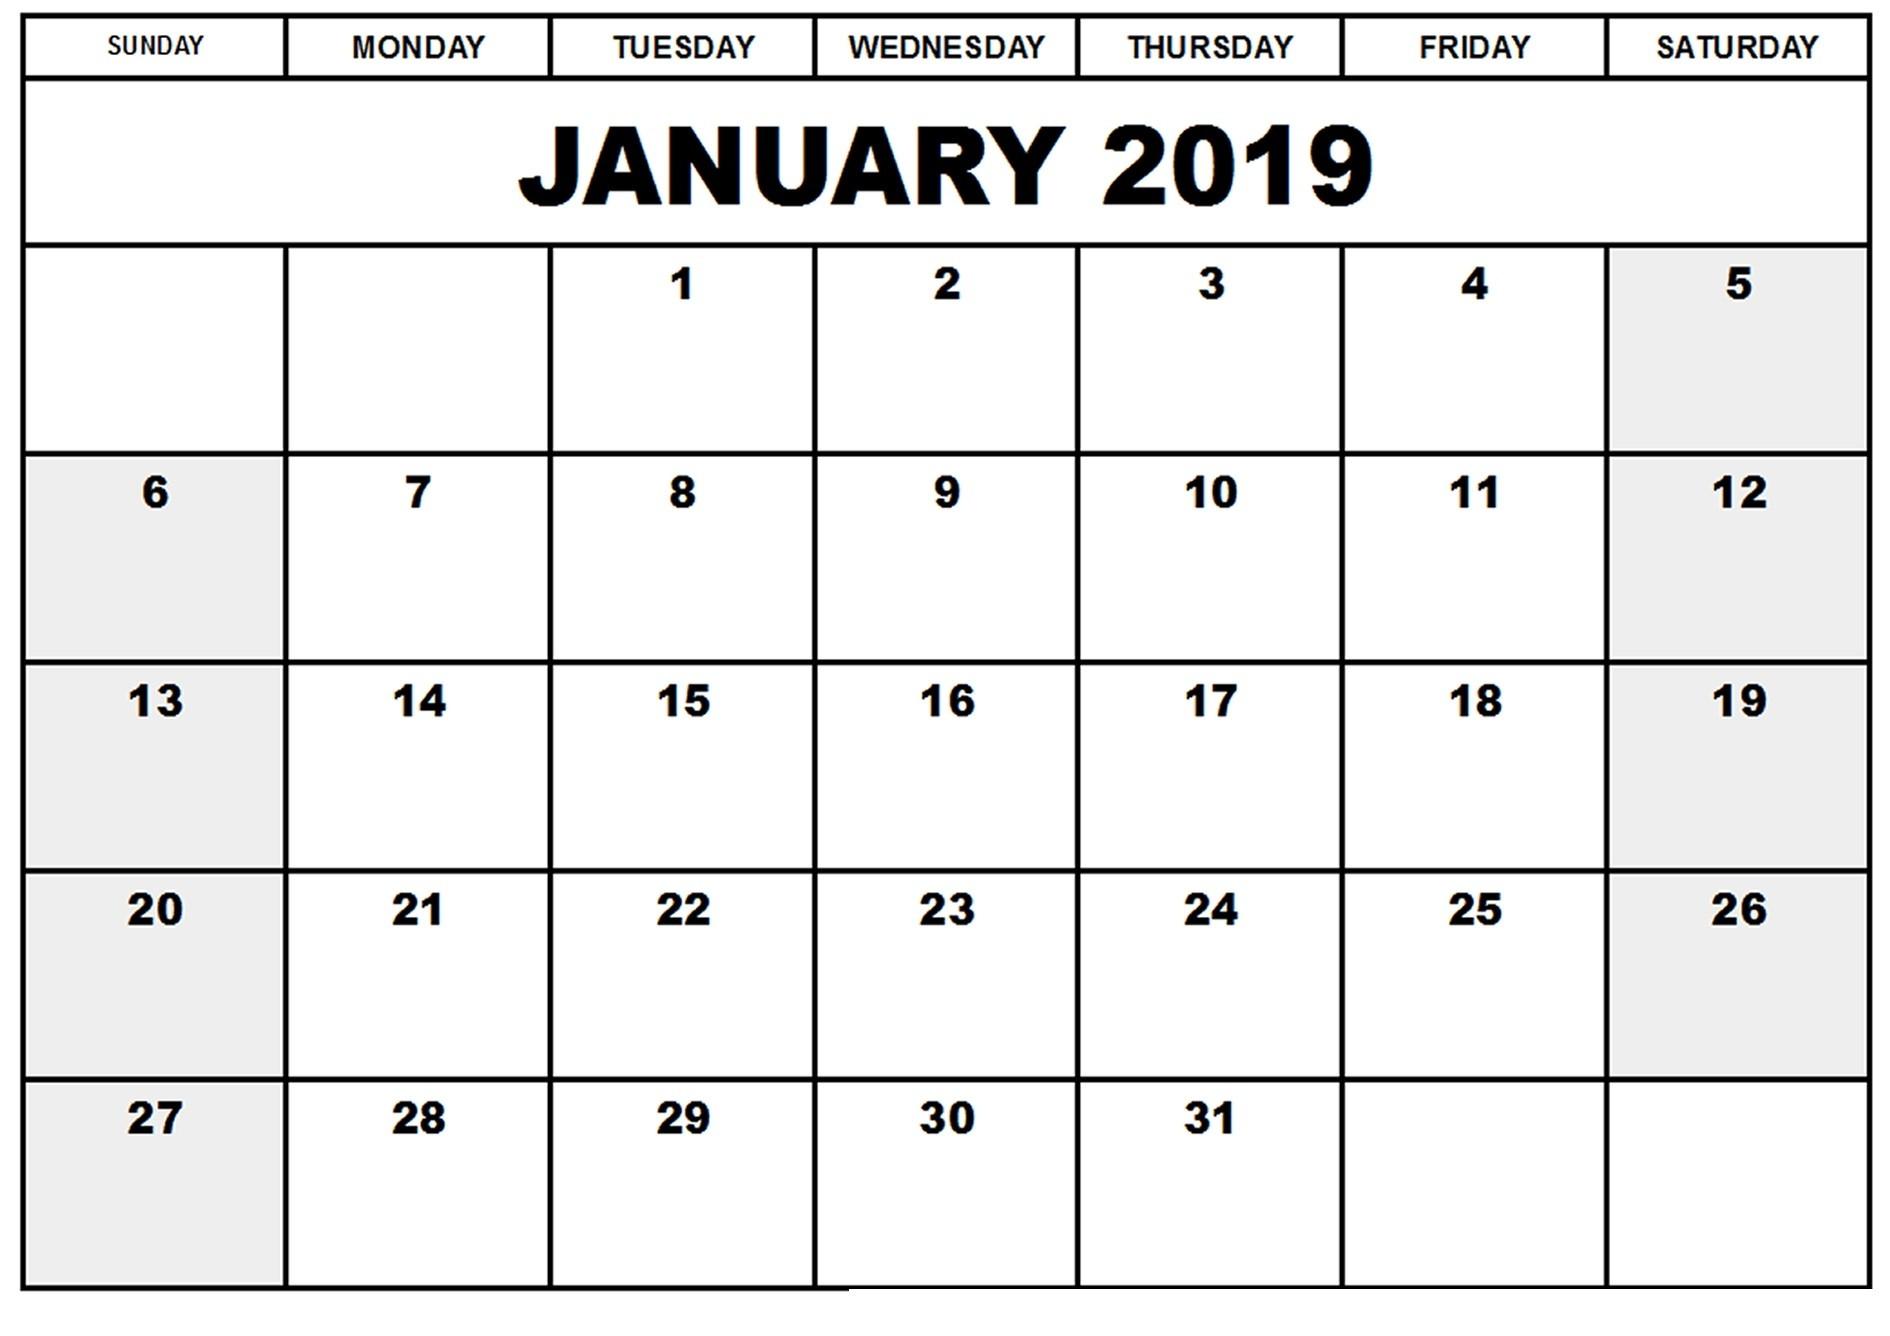 Download Kalender islam 2019 Pdf Actual Get Free Printable January 2019 Calendar with Holidays Of Download Kalender islam 2019 Pdf Más Reciente Download Free Bank Holiday 2019 Usa Calendar Templates [pdf